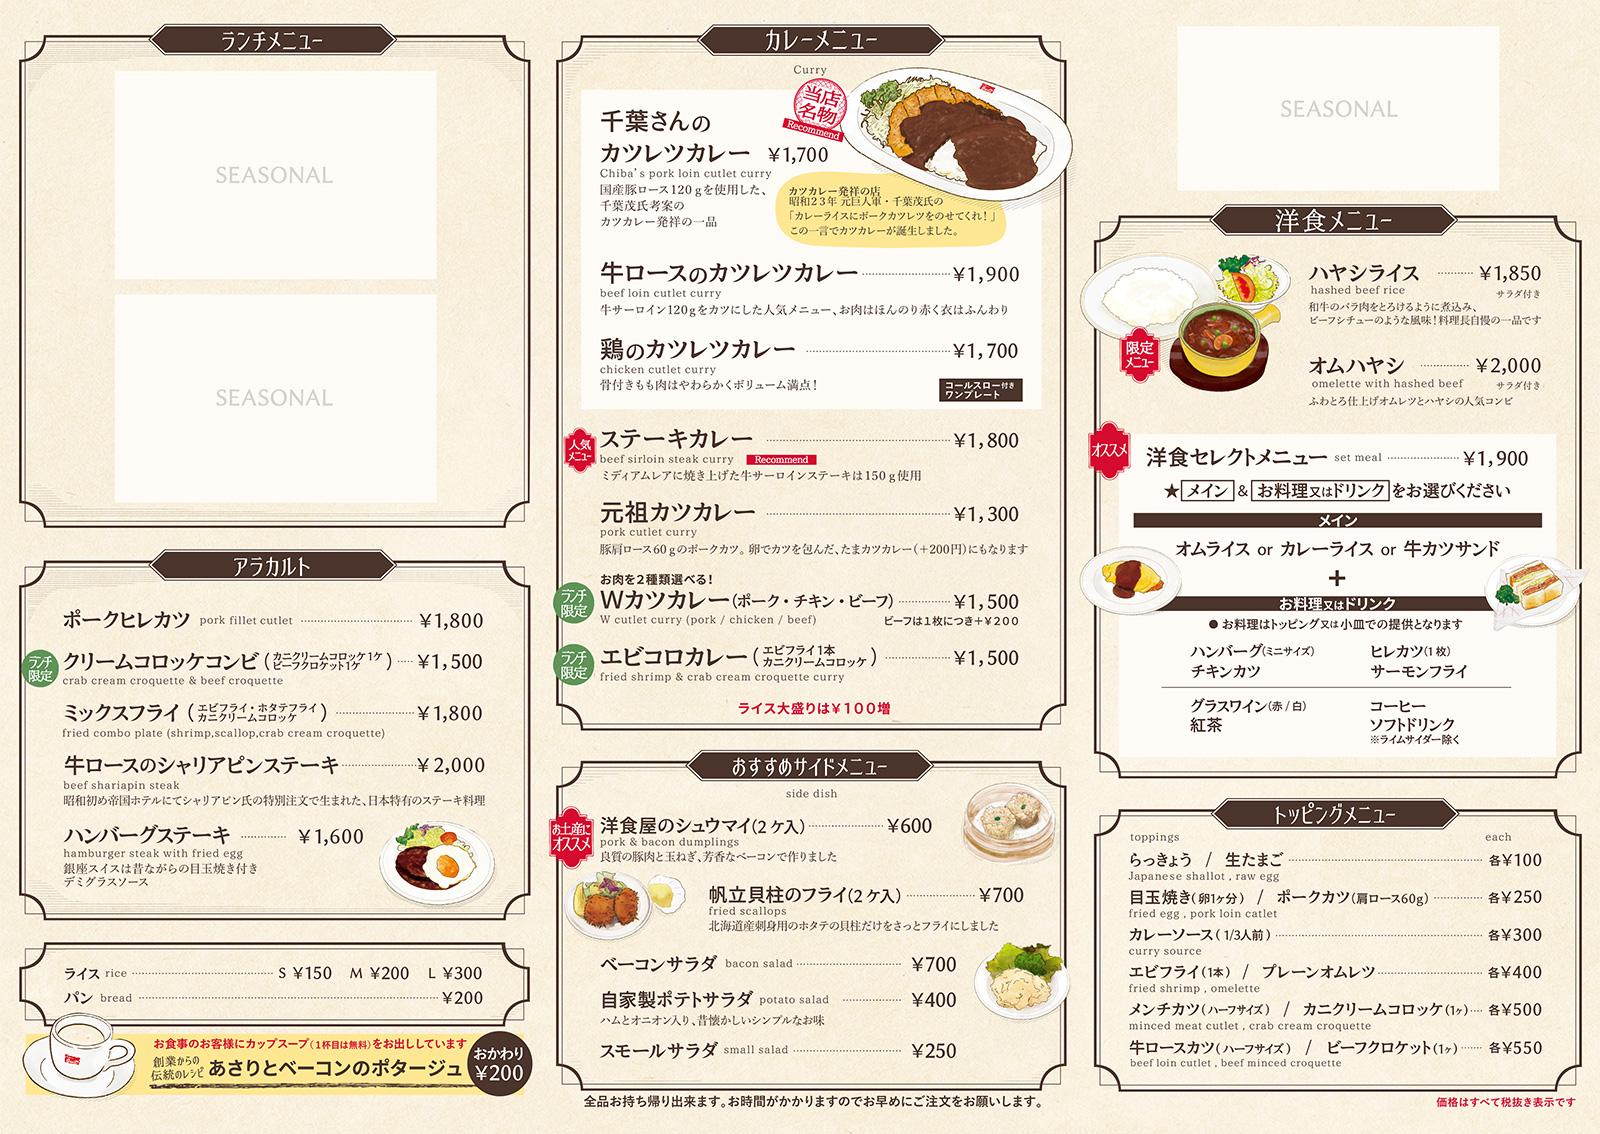 GrandMENU_SWISS_naka_202008_Lunch